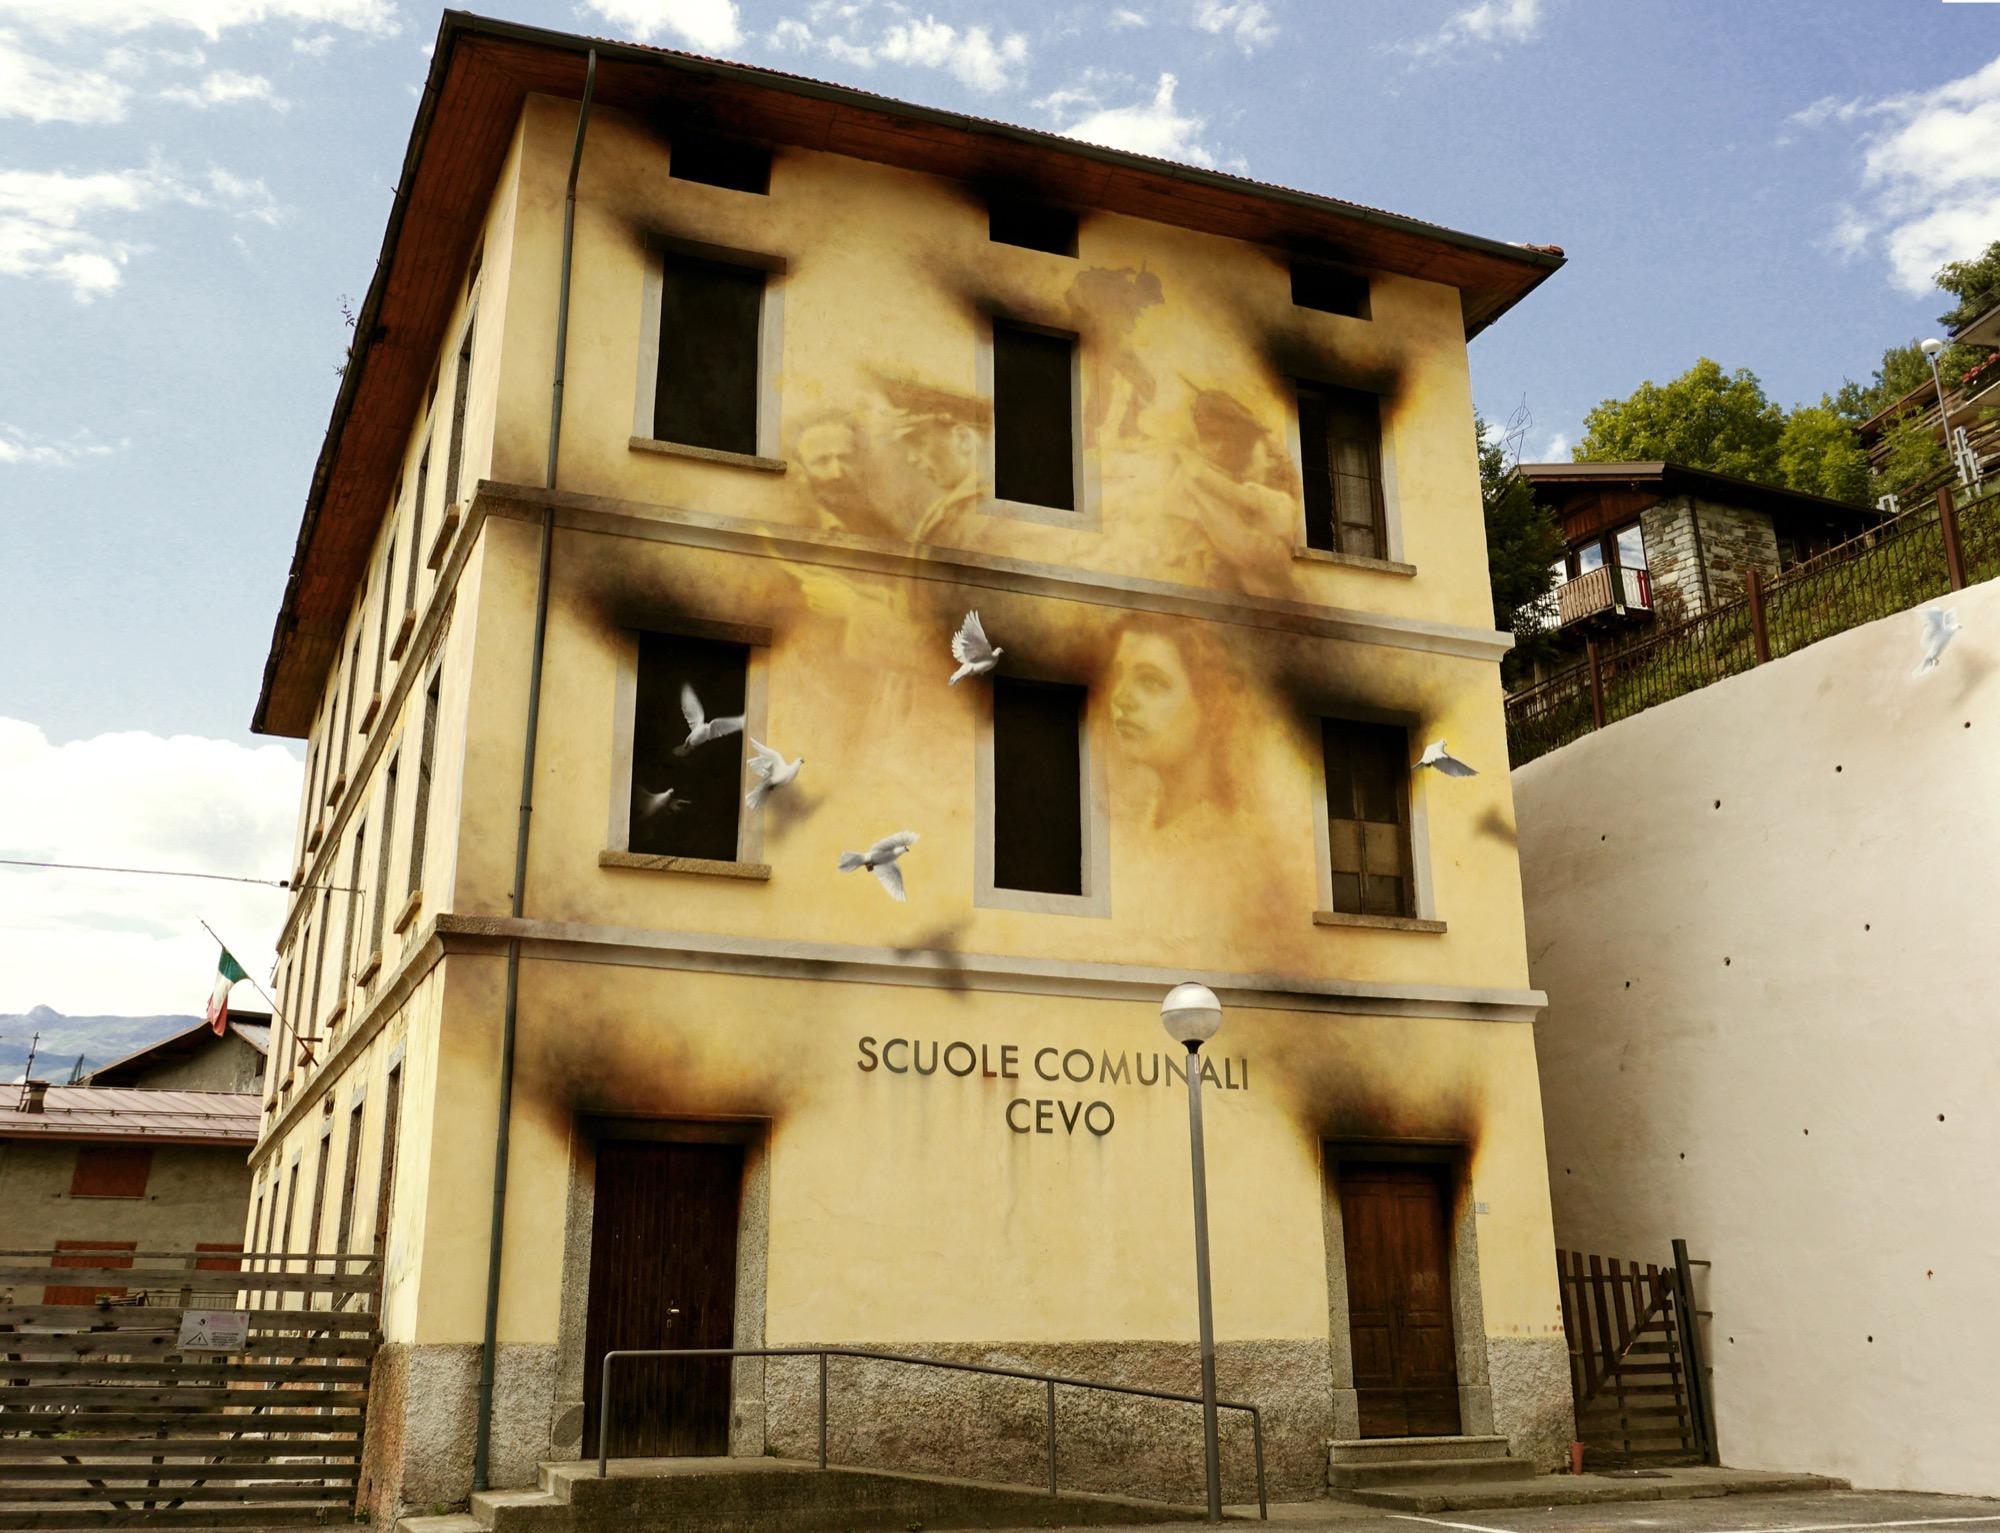 Anti-War Mural by Eron in Cevo, Italy | StreetArtNews | StreetArtNews